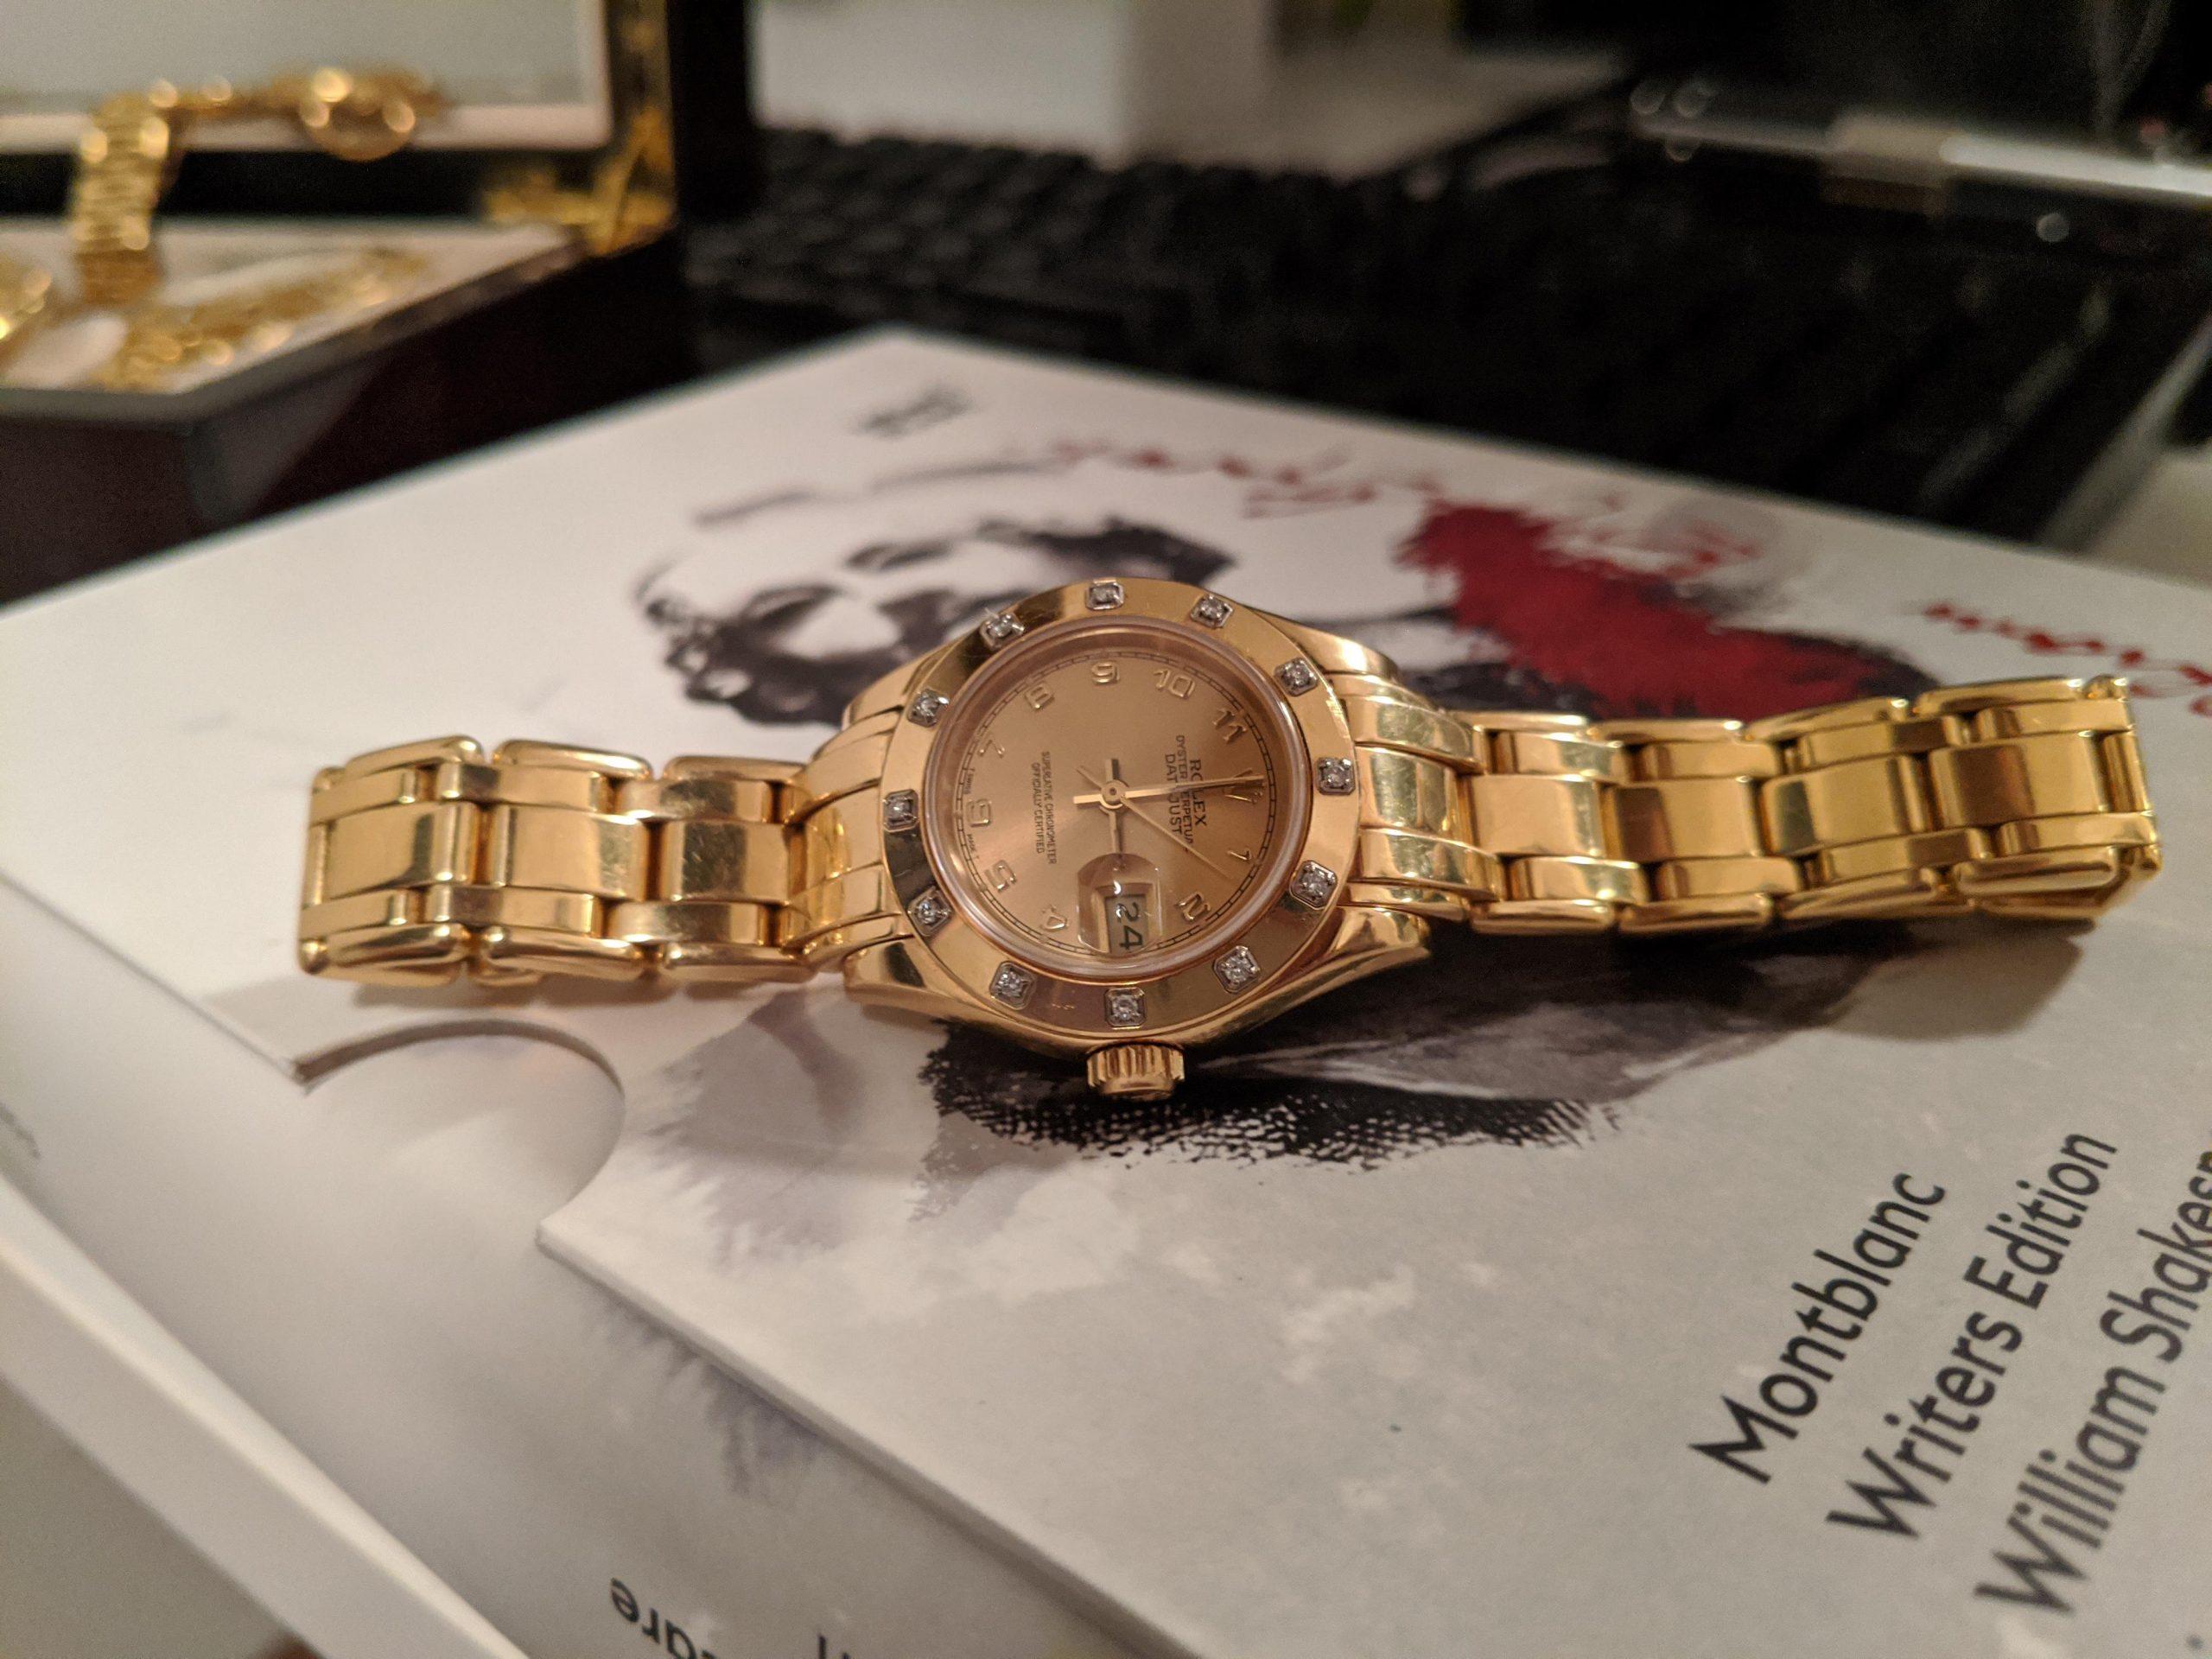 Purchasing A Genuine Rolex Watch